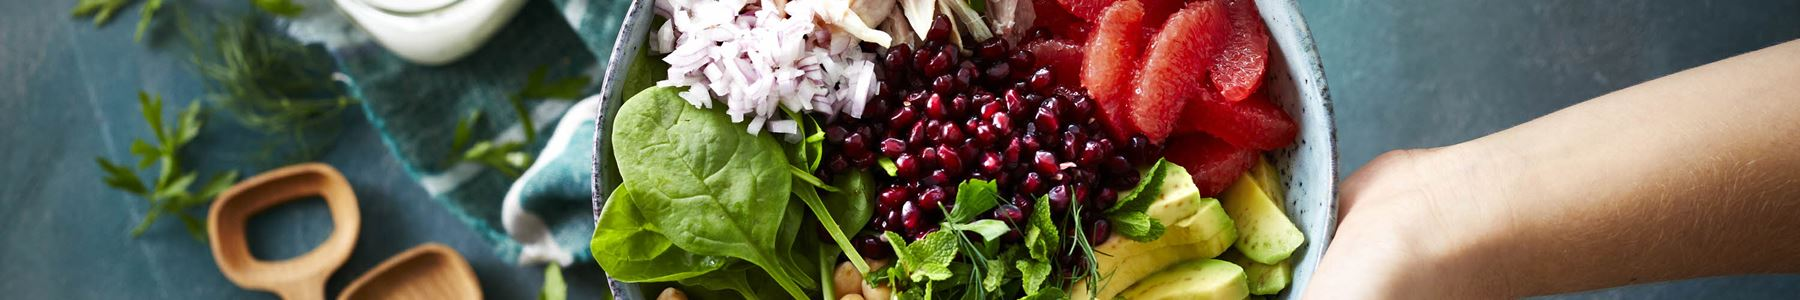 Kikært + Salater + Hvidløg